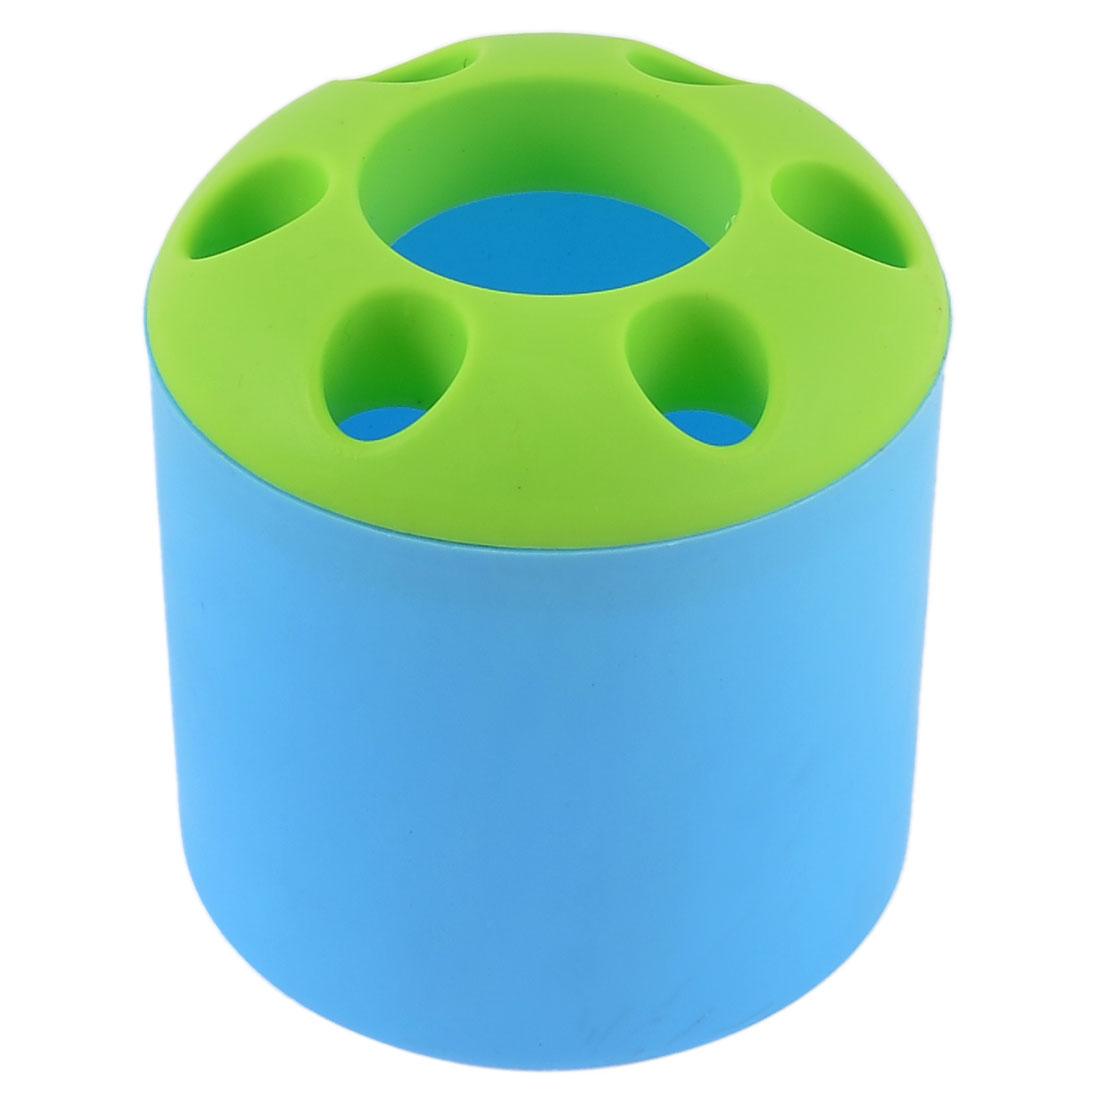 Bathroom Toothbrush Toothpaste Plastic Storage Organizer Holder Cup Blue